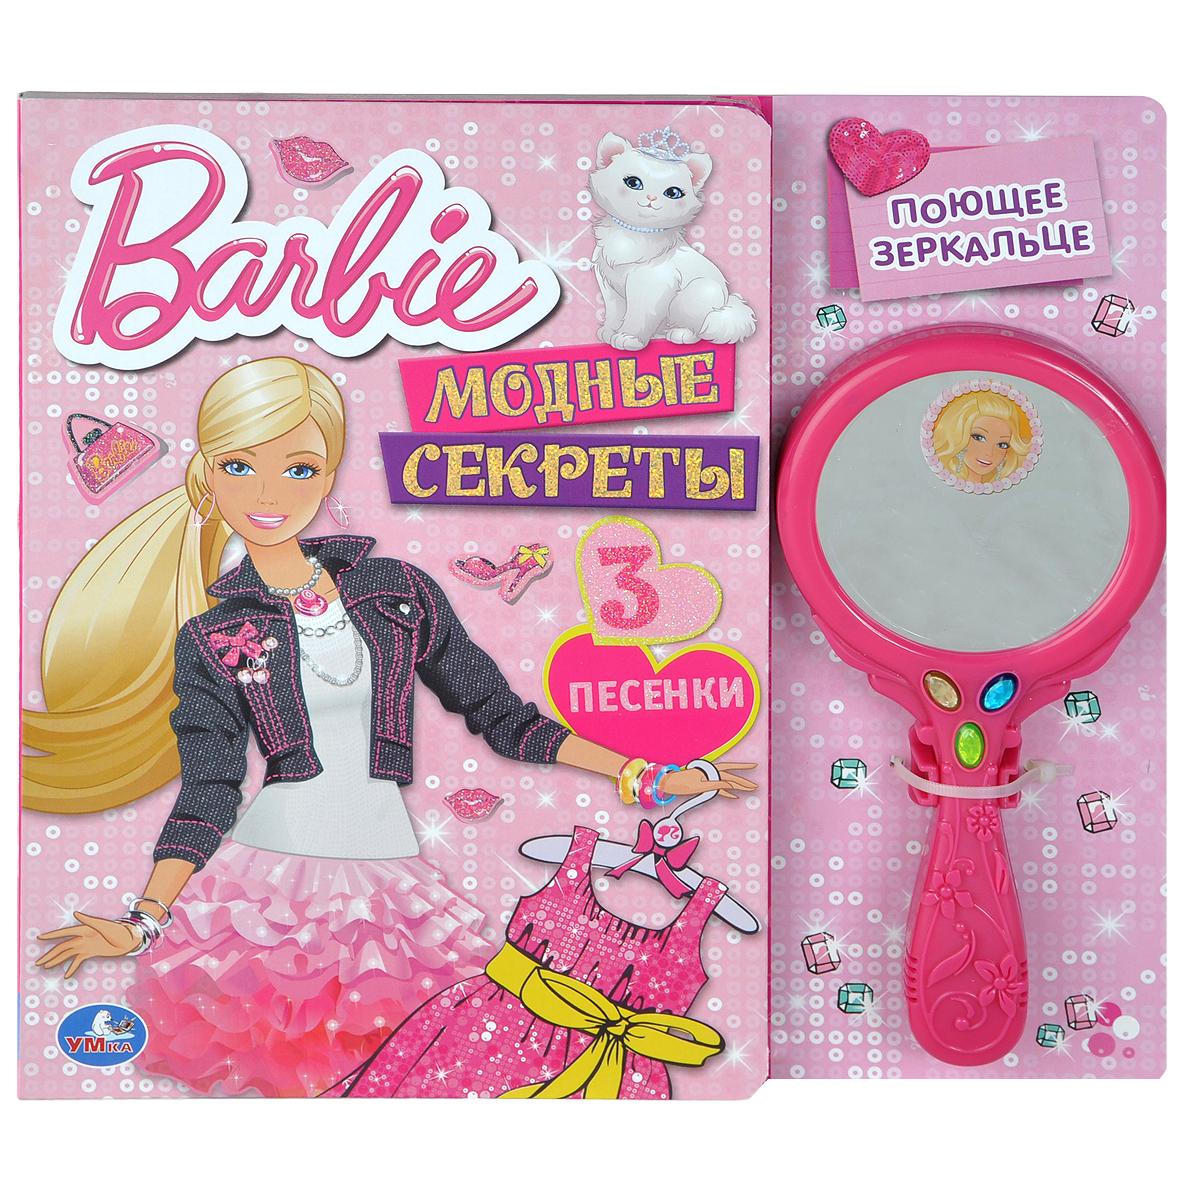 Кристина Хомякова Barbie. Модные секреты (+ игрушка) приставки к электрогитаре секреты ретро звучания